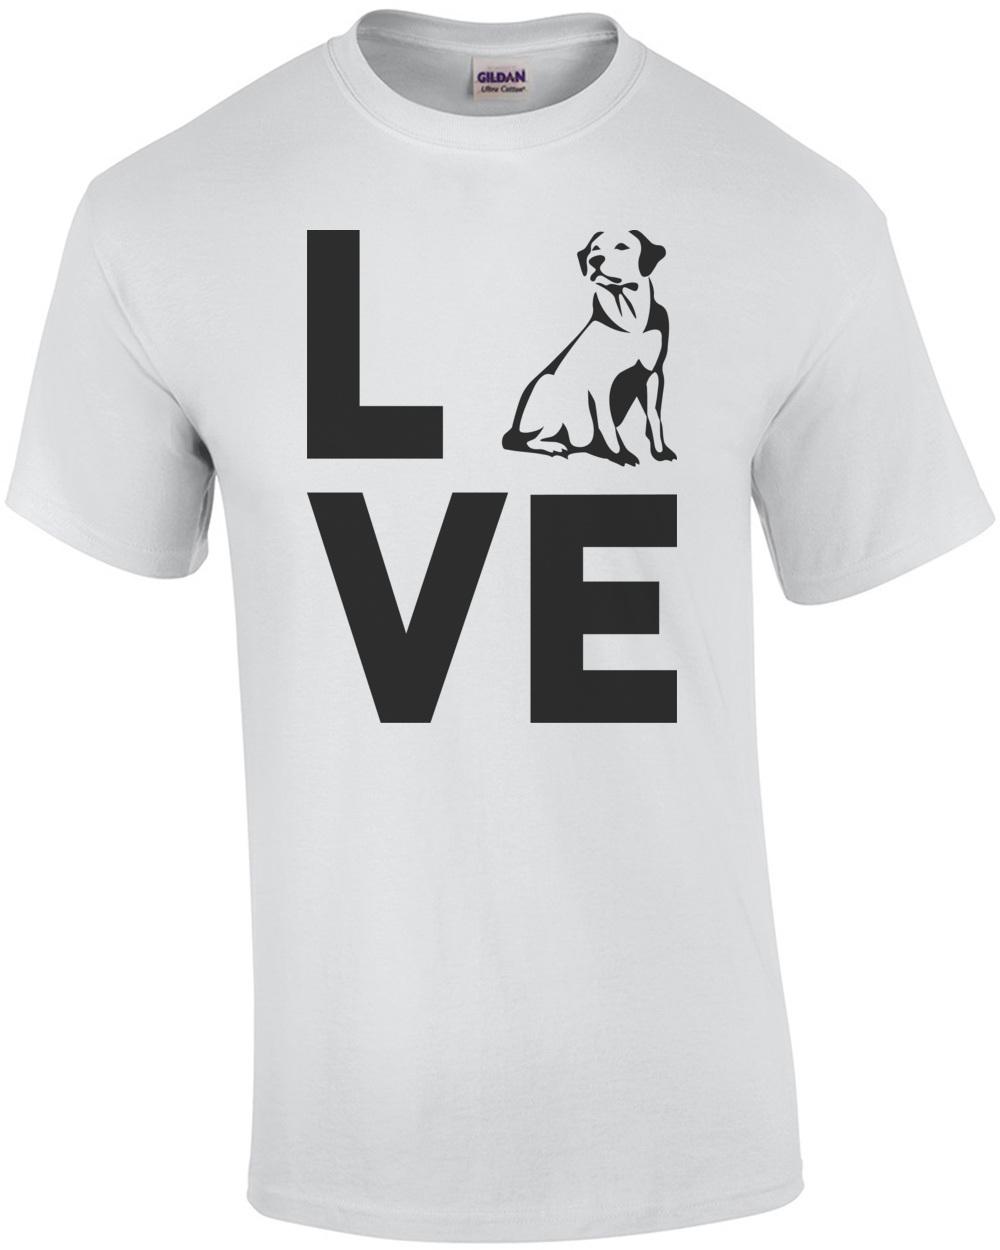 Ideal Labrador Love - Labrador T-Shirt MV63